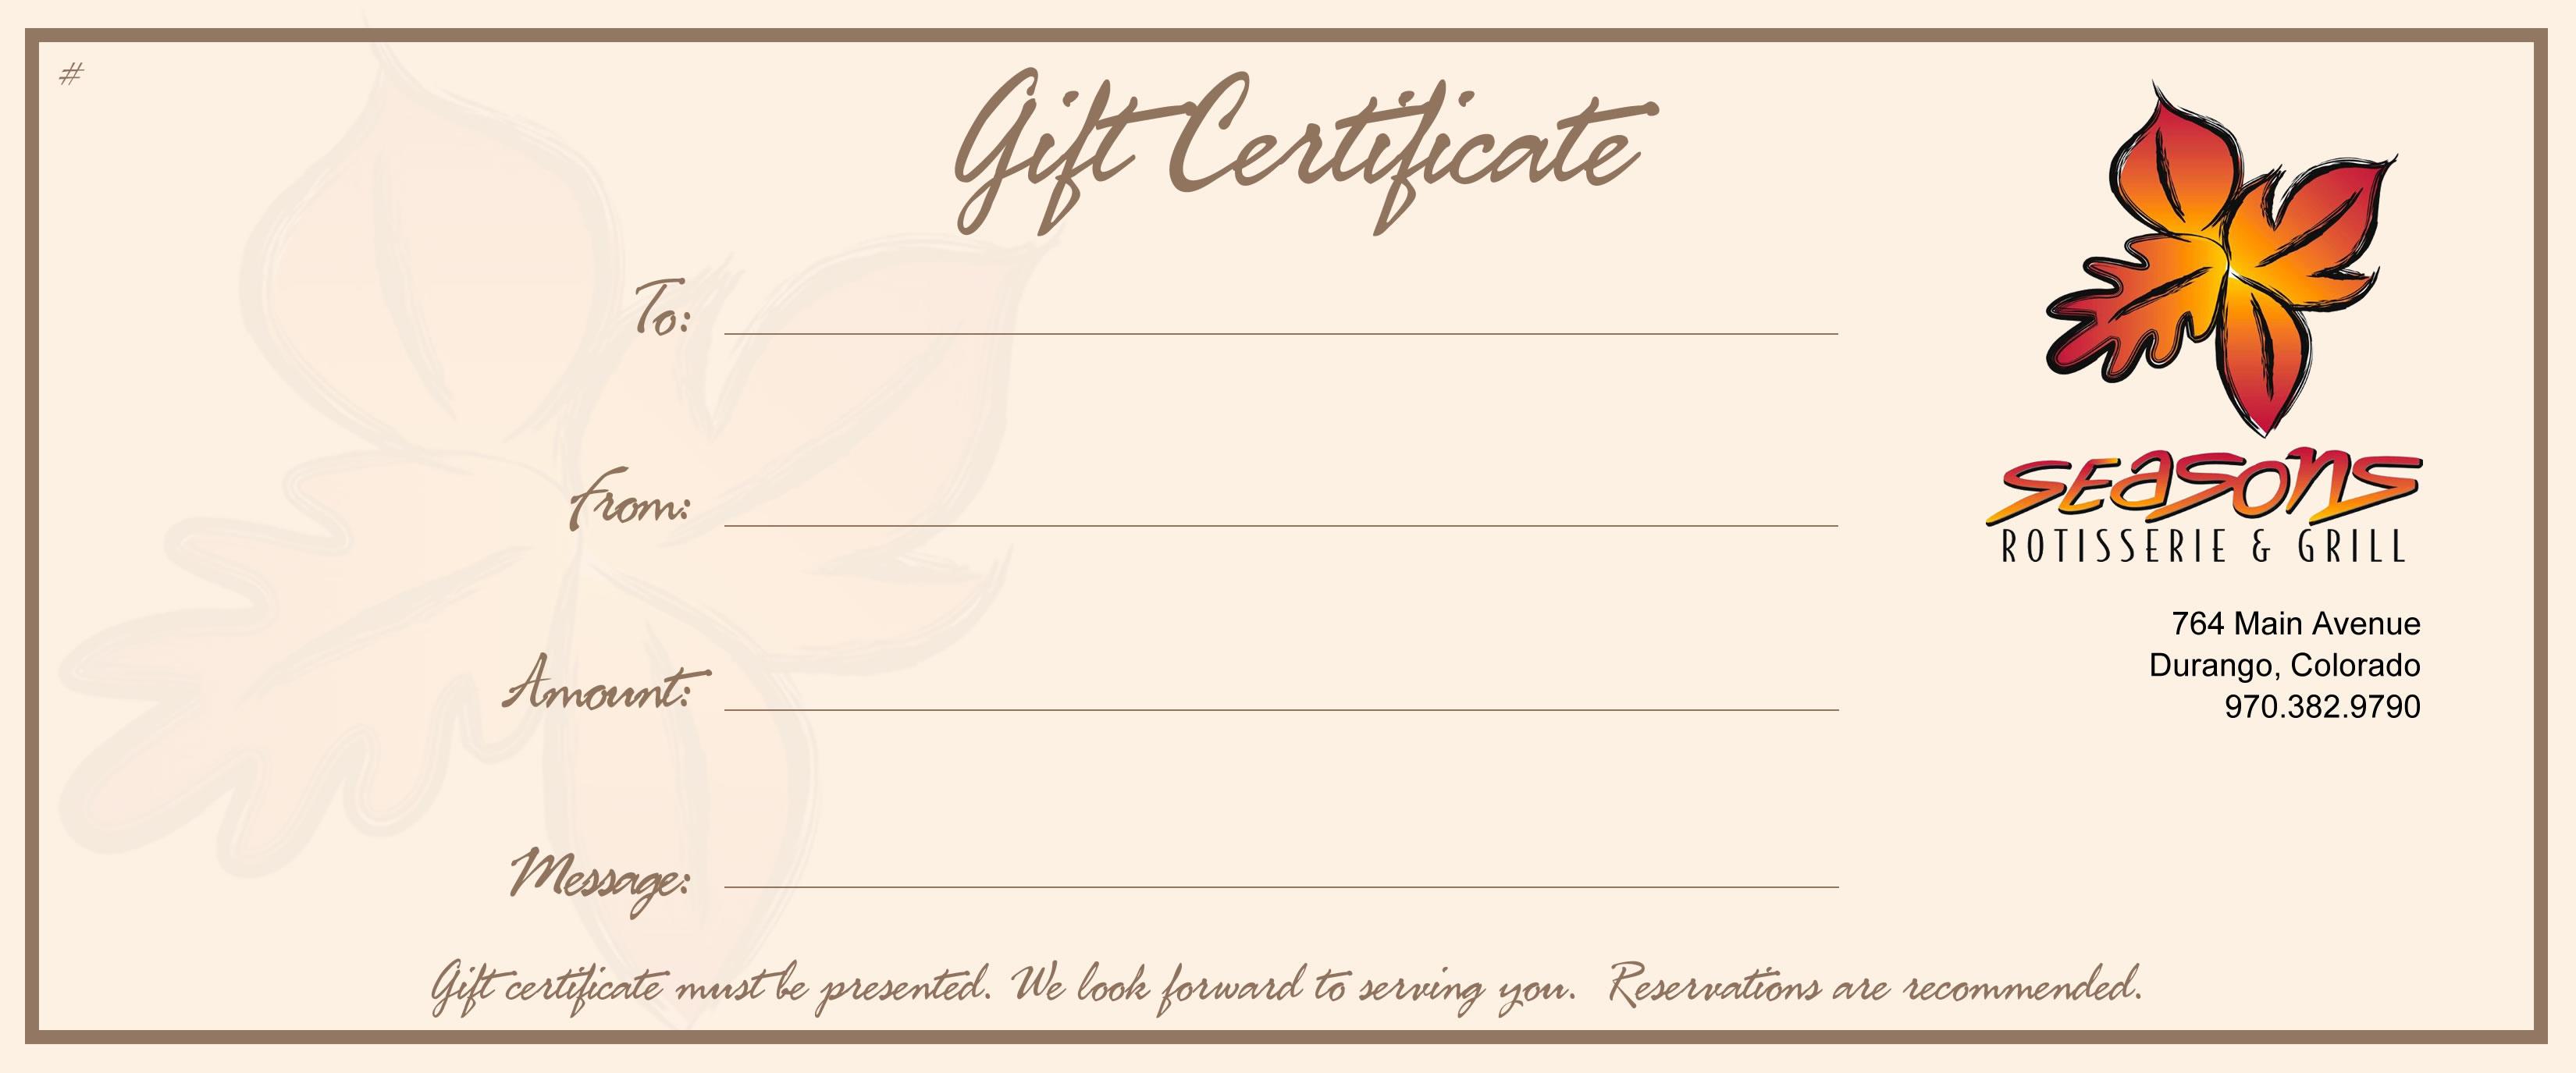 seasons gift certificate seasons of durango